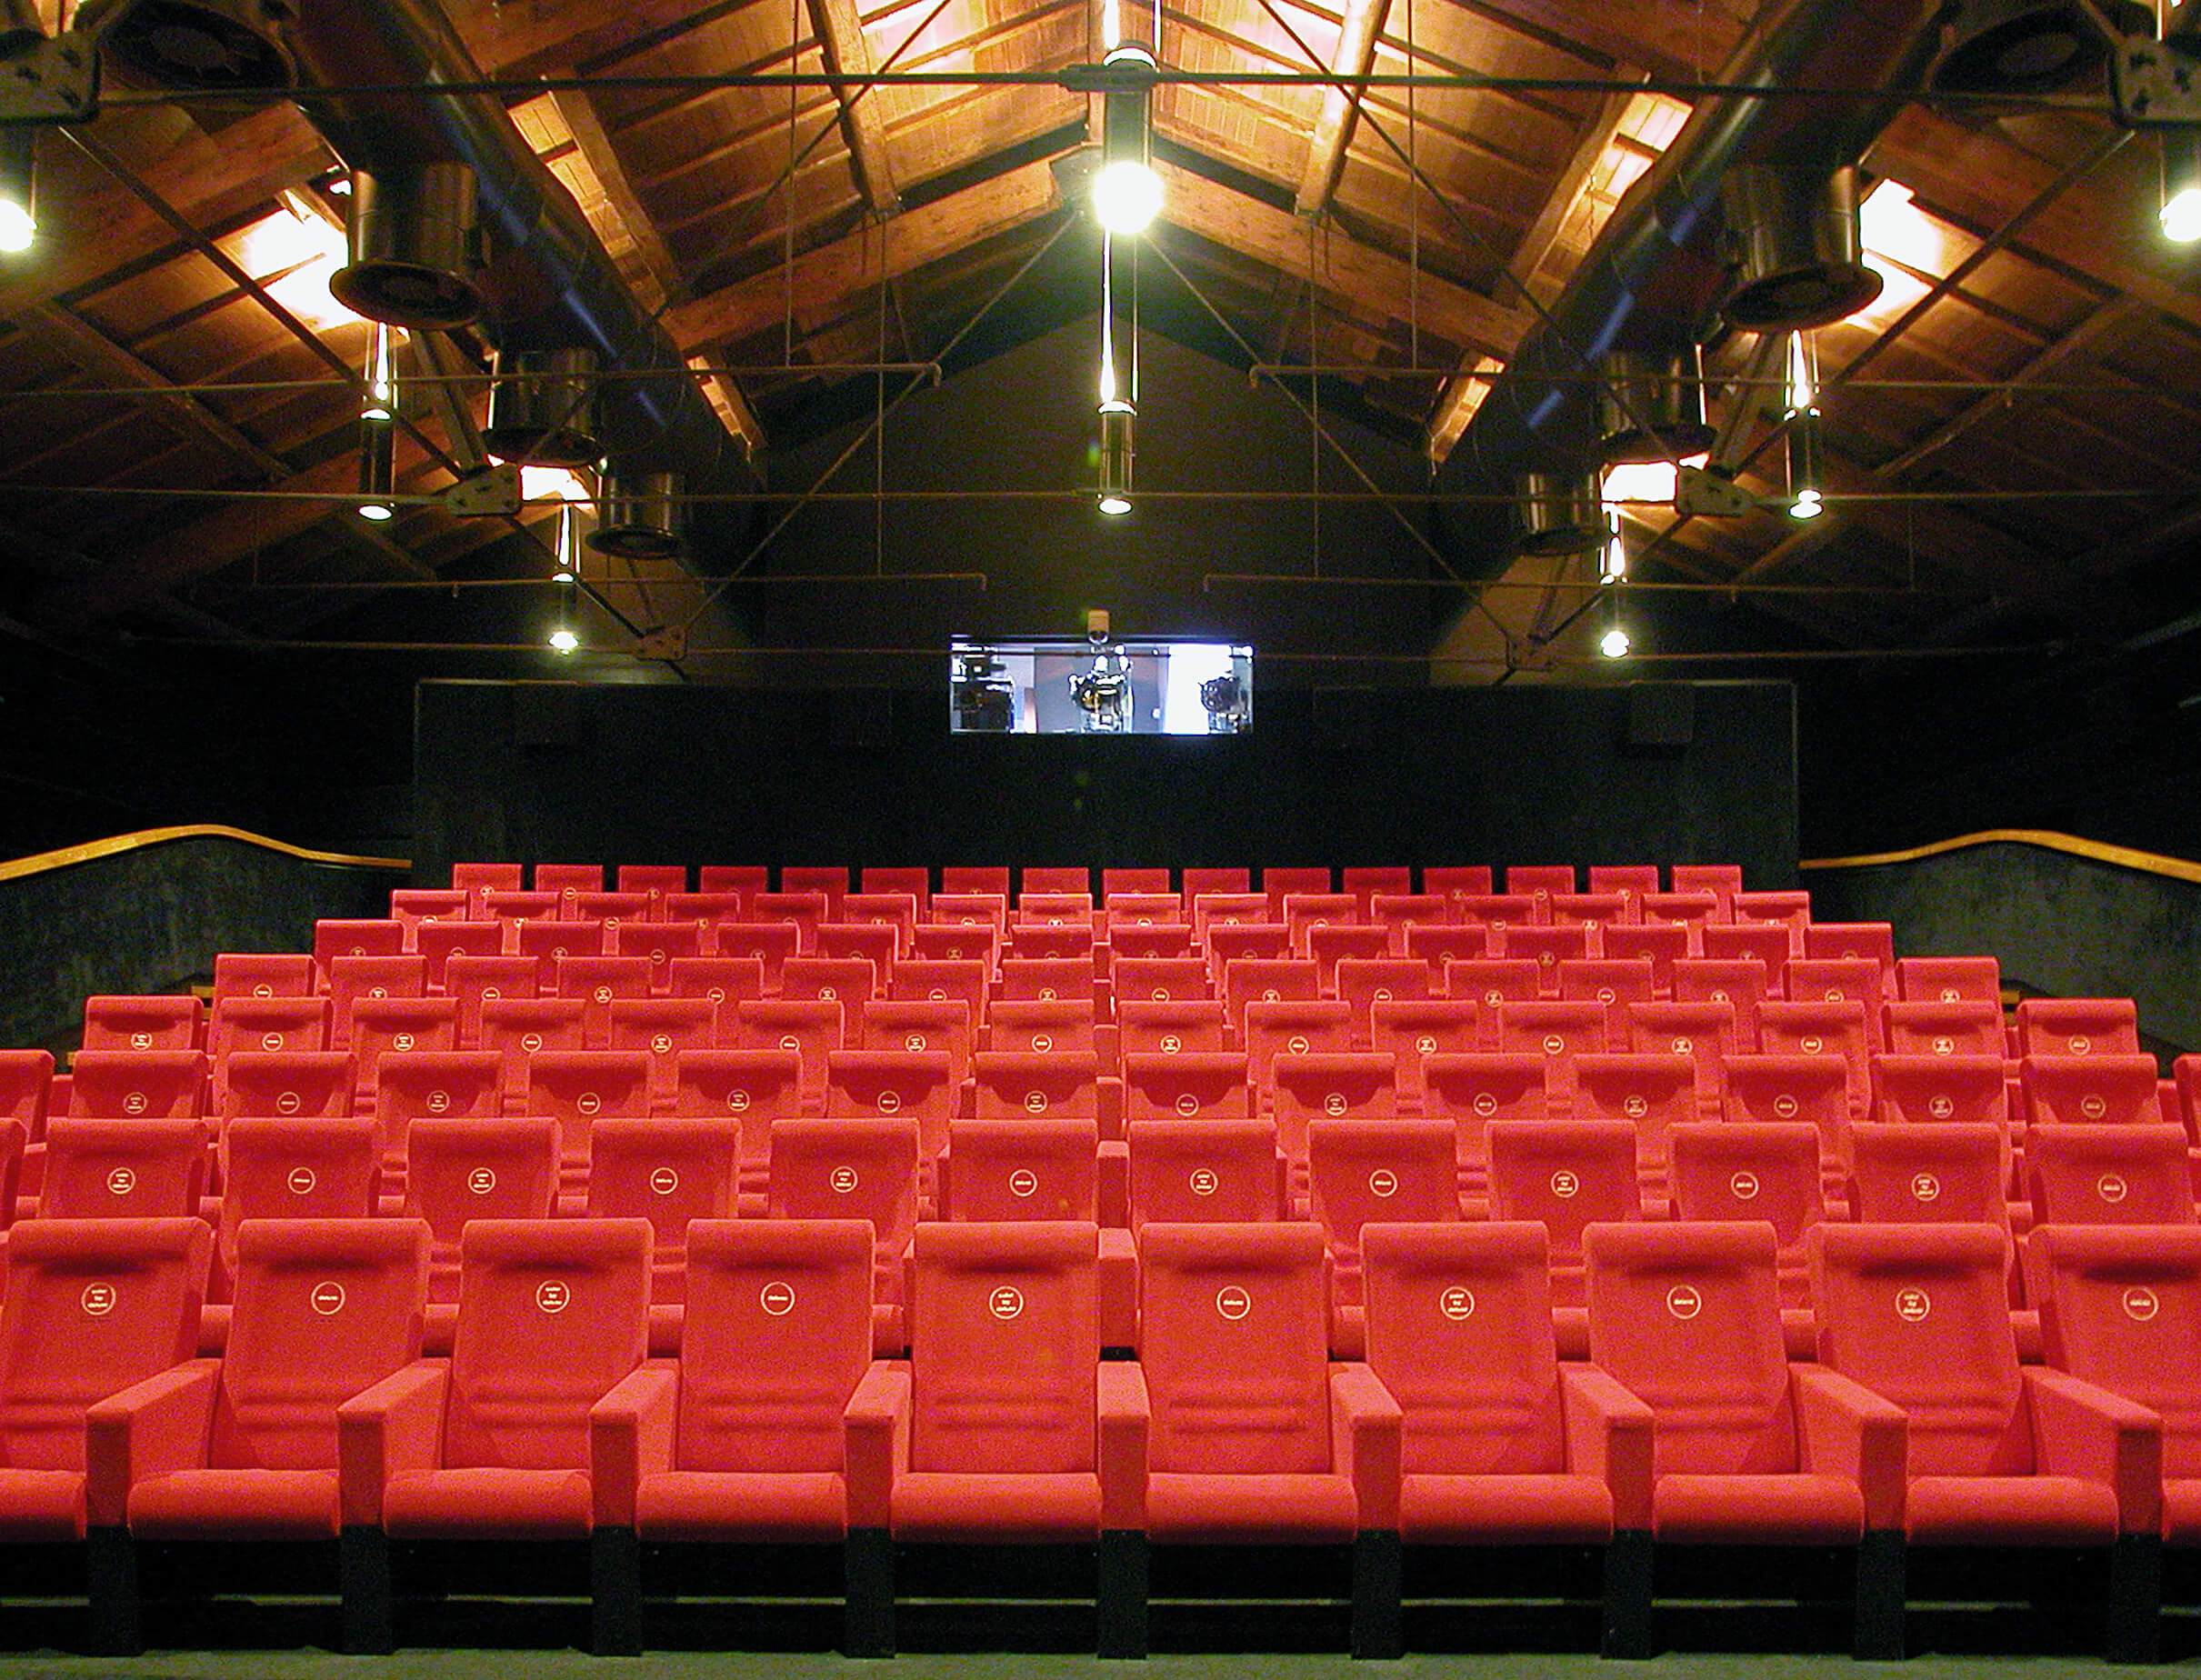 Sala cinema casa del cinema tappezzeria d 39 arredamento - Sala cinema in casa ...